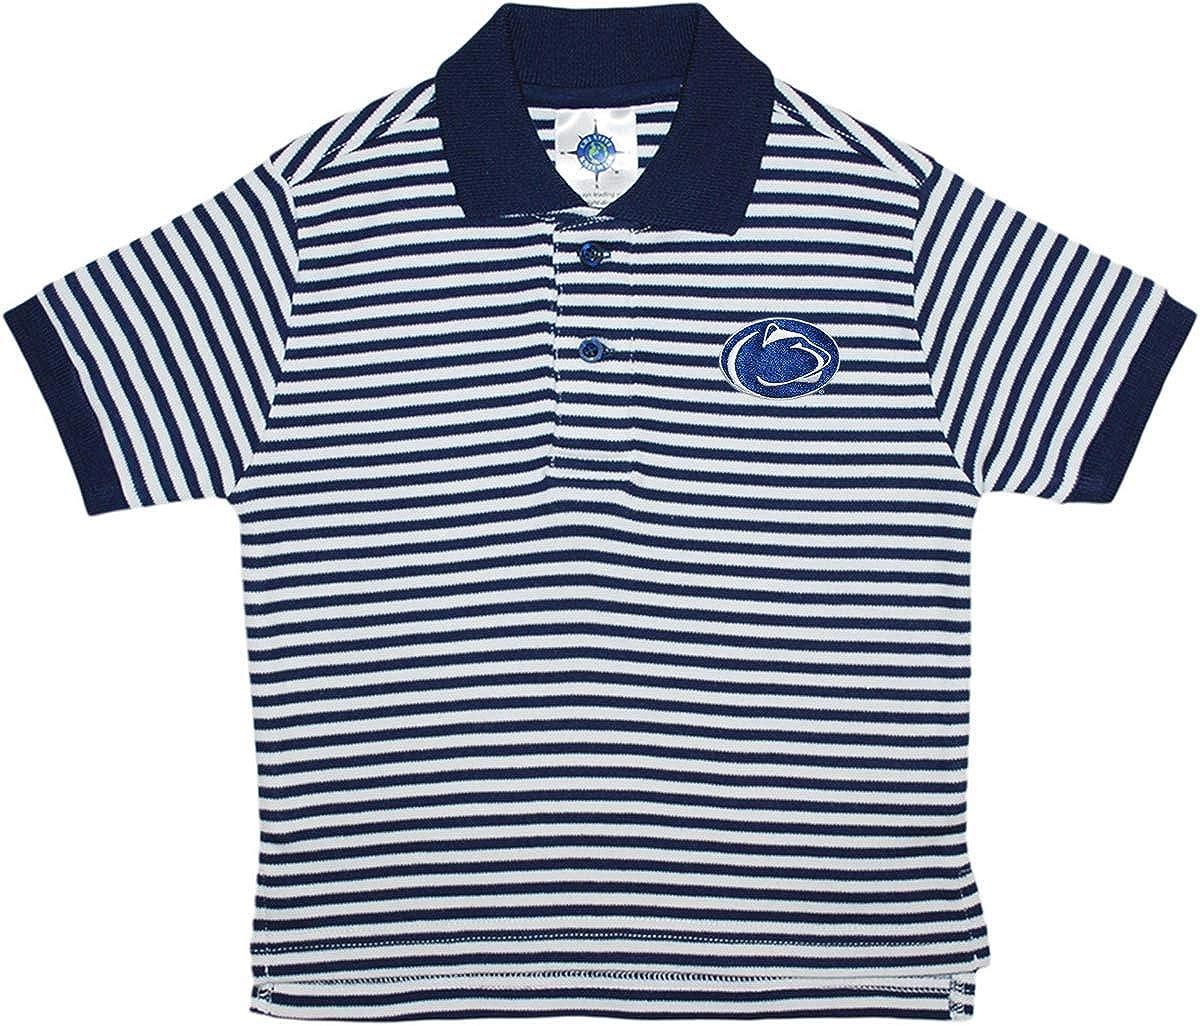 Amazon Penn State University Nittany Lions Striped Polo Shirt